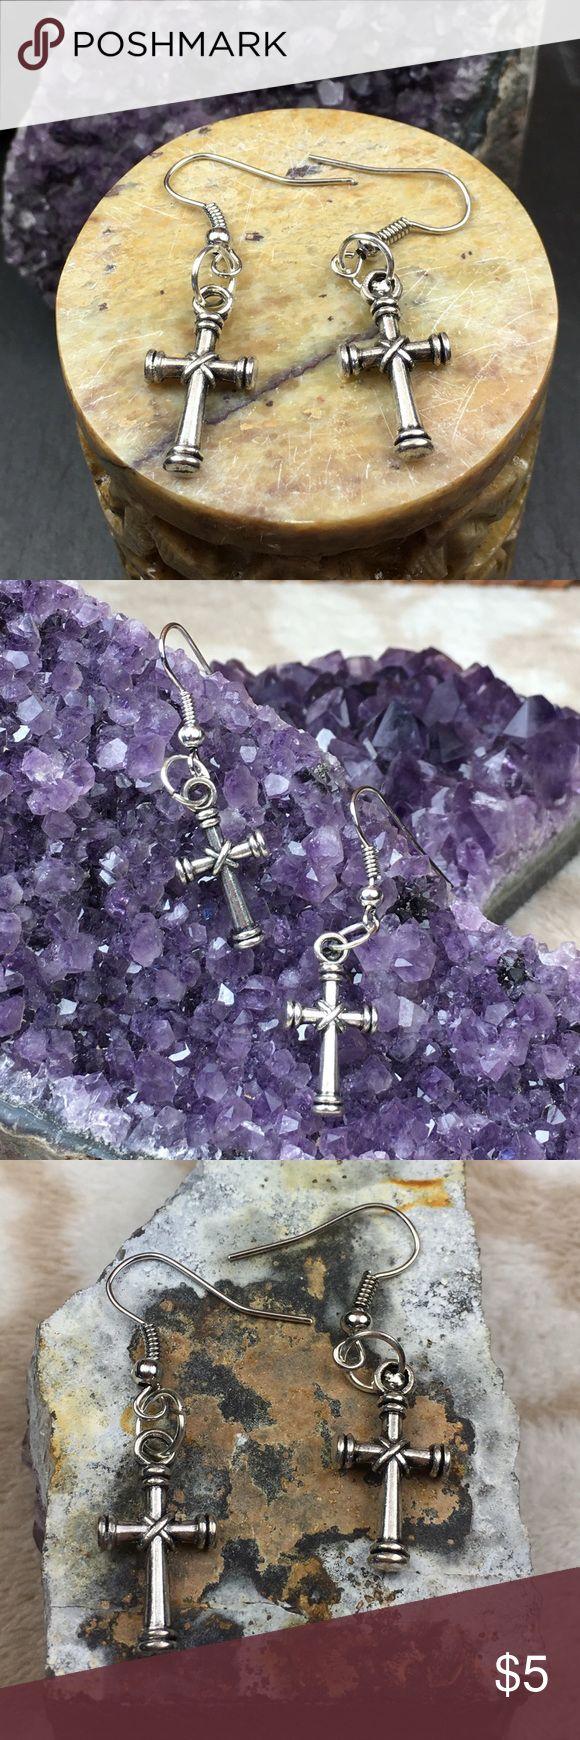 Cross Earrings Brand New. Tibetan Silver Cross charms. Fish Hook earrings are nickel and lead free. Handmade earrings. Jewelry Earrings